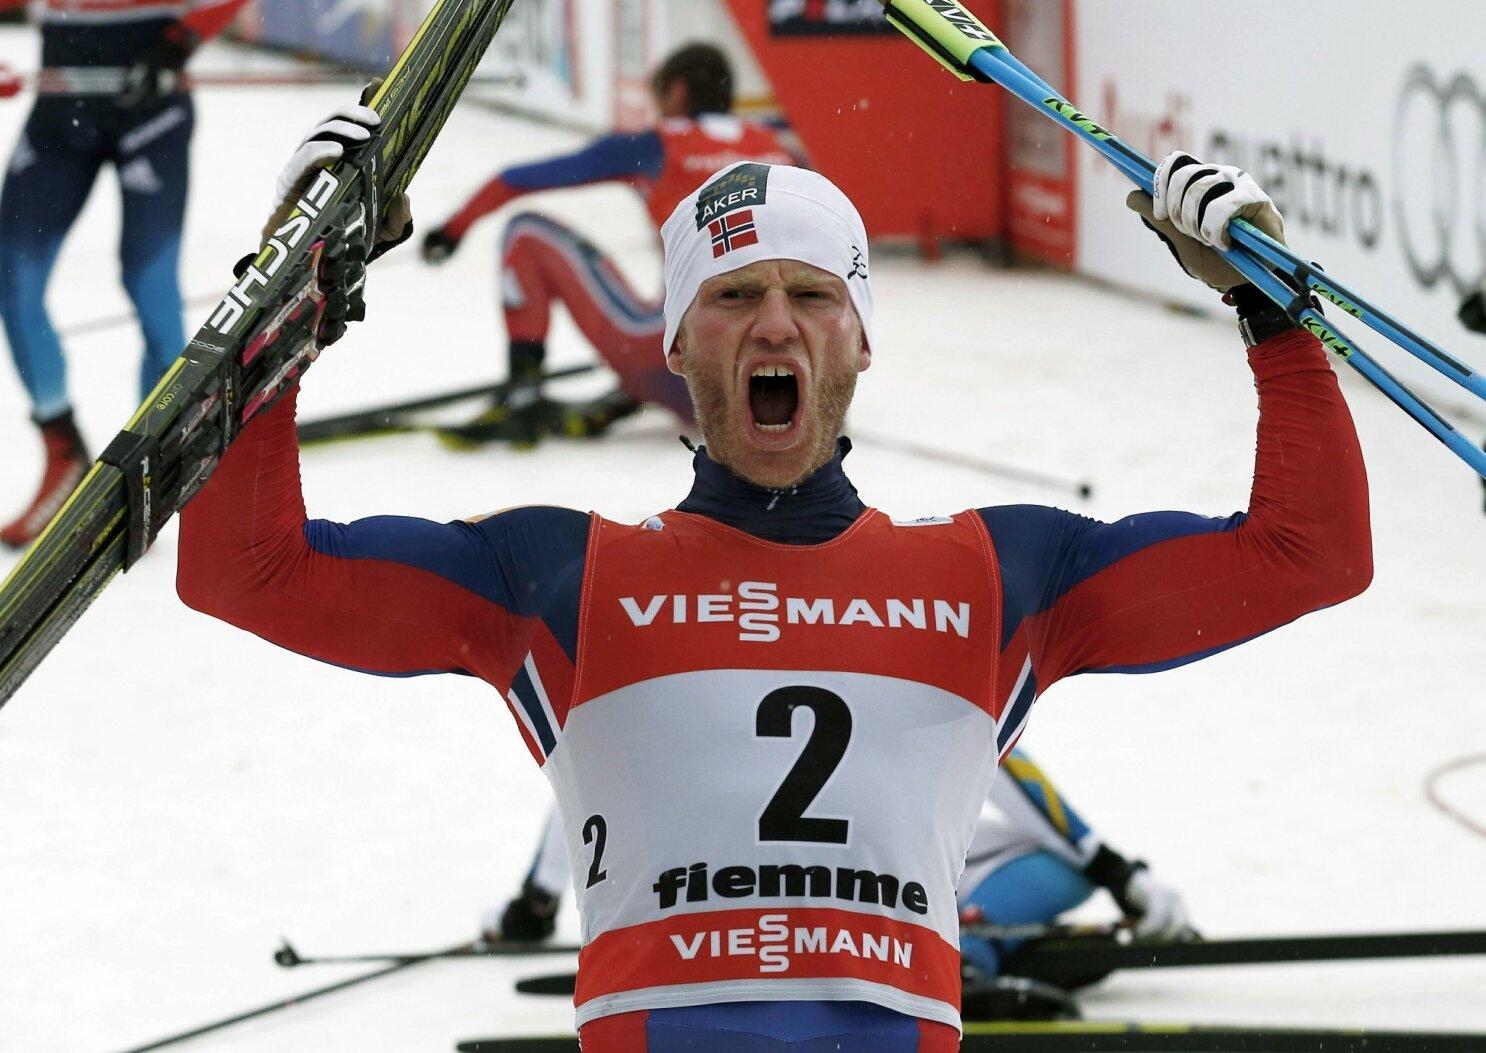 Skier Johnsrud Sundby Loses Titles After Doping Infringement The San Diego Union Tribune